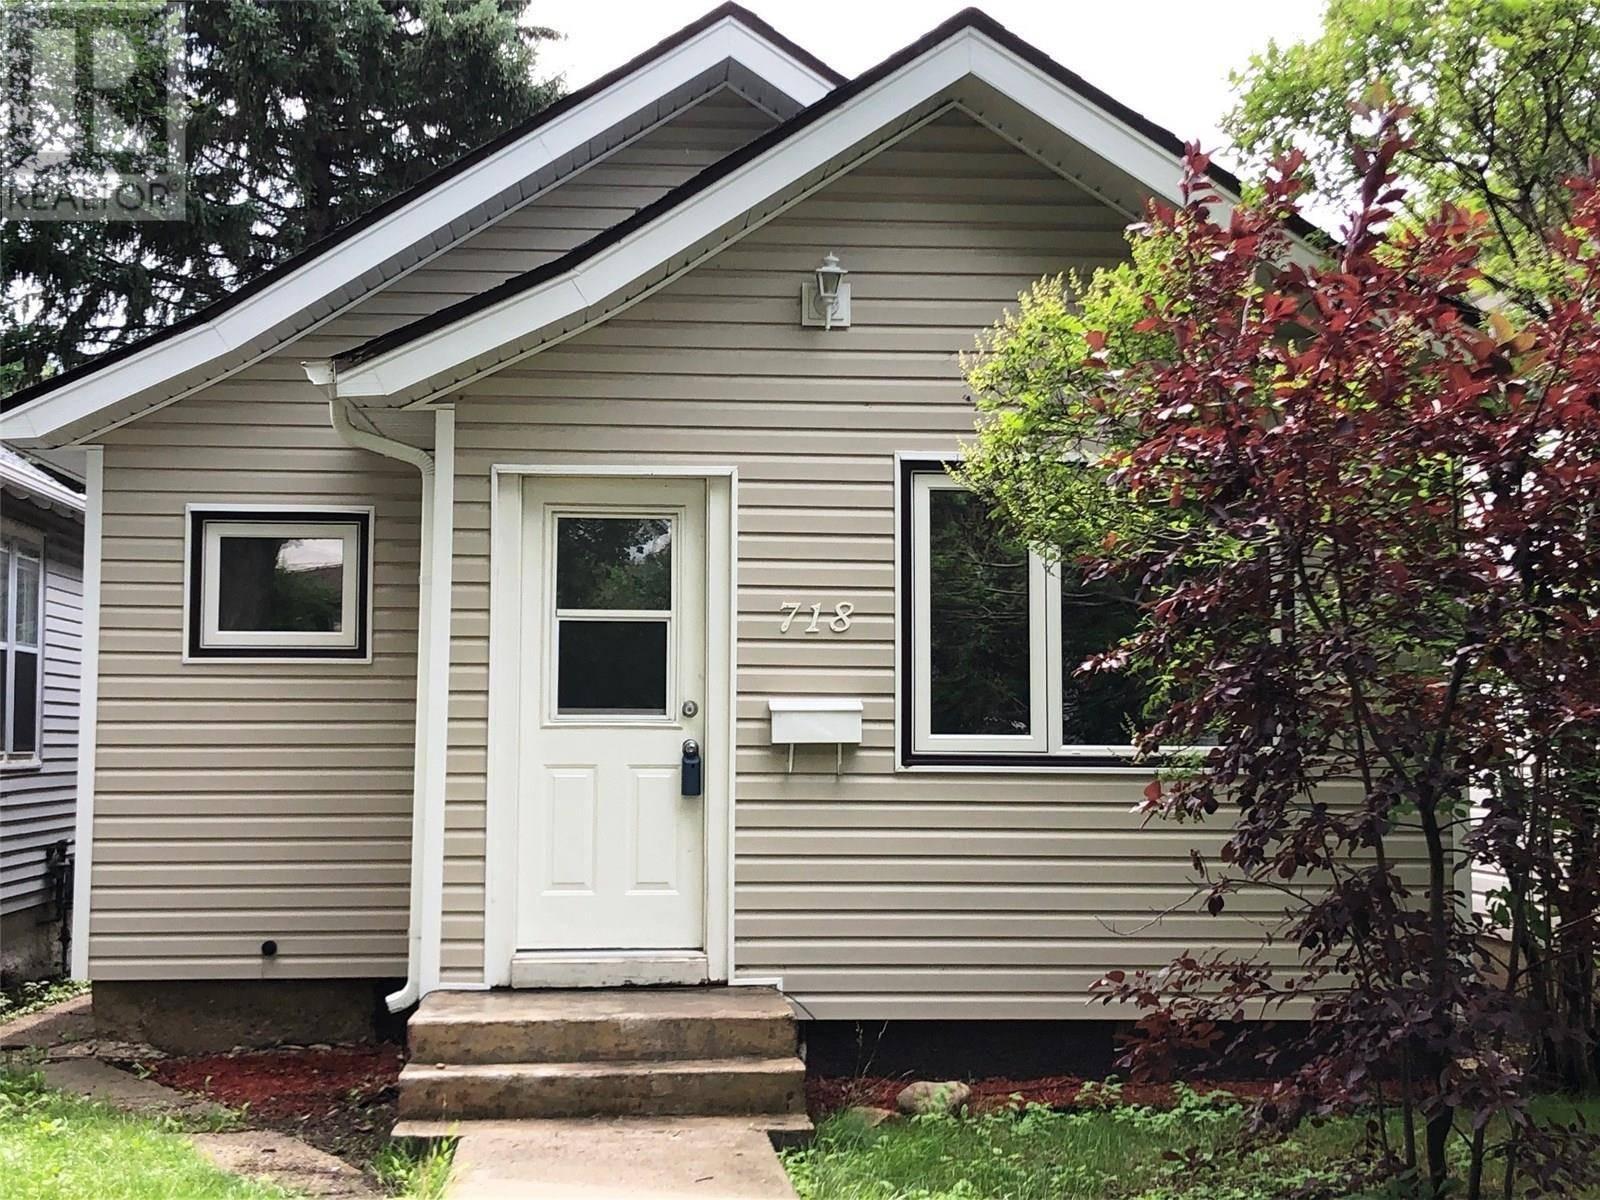 House for sale at 718 7th St E Saskatoon Saskatchewan - MLS: SK785595